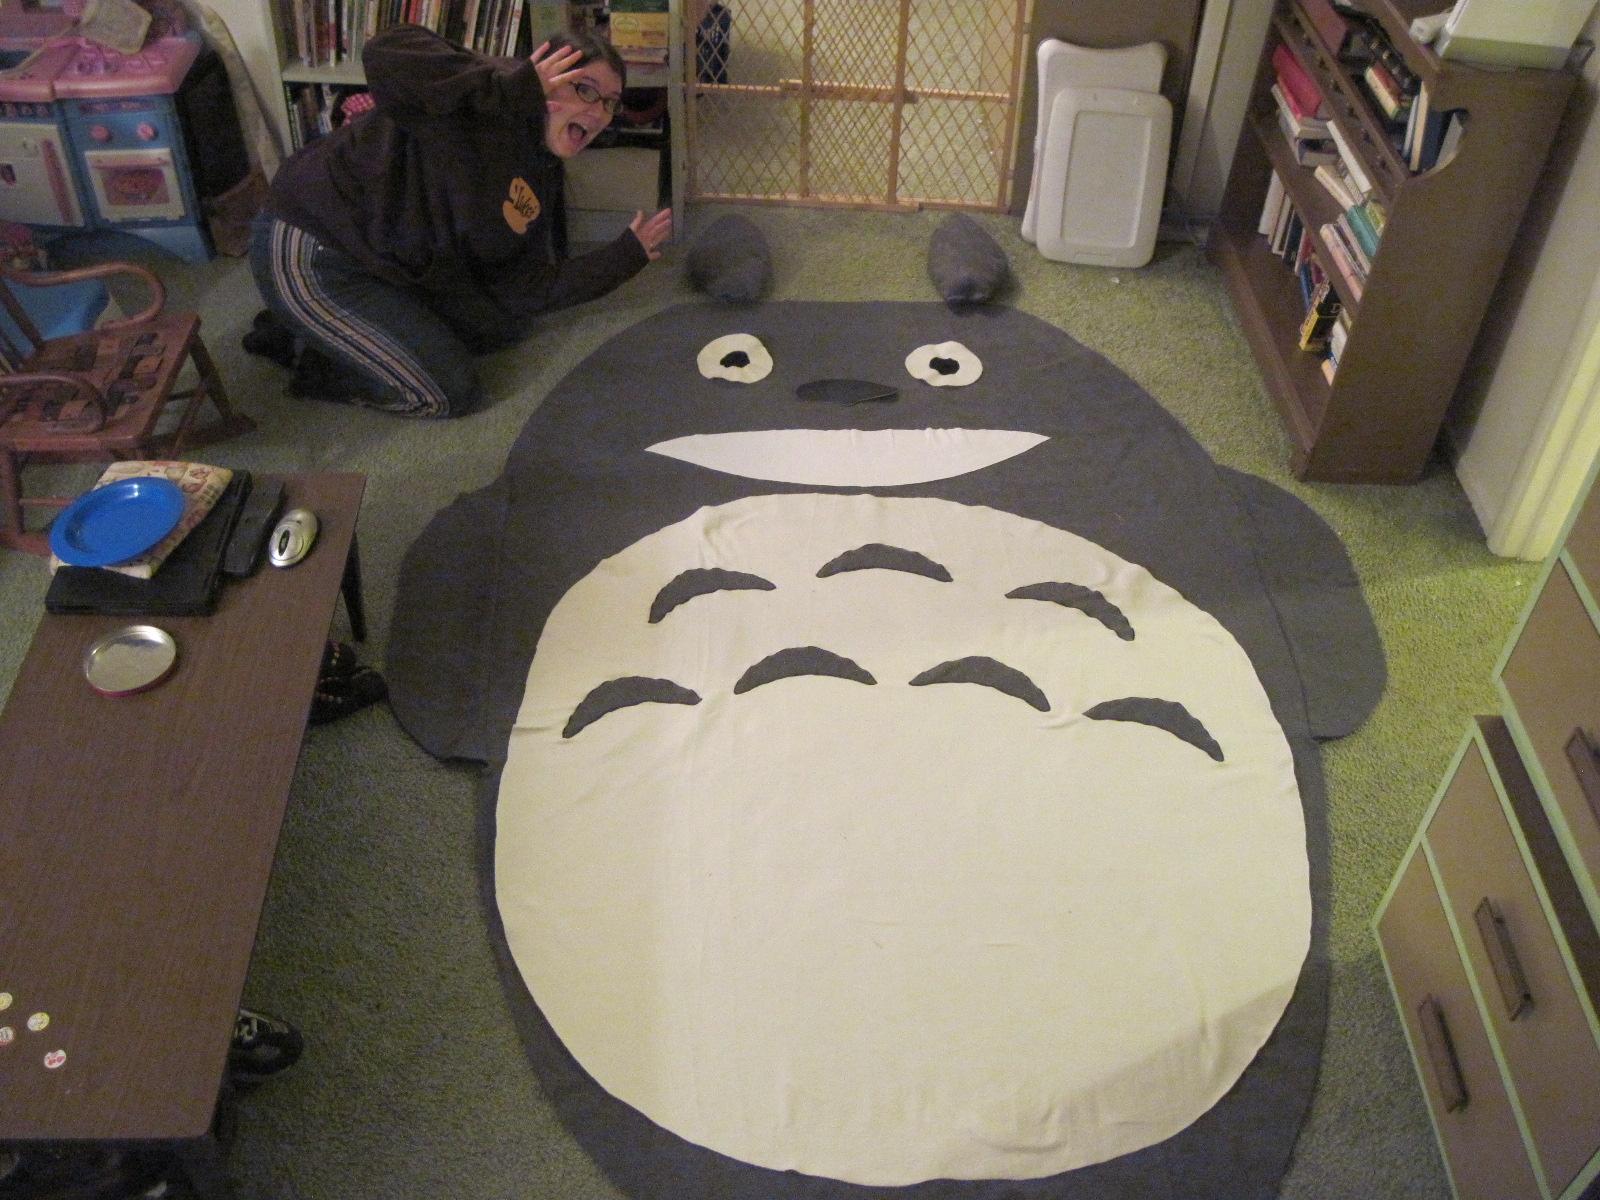 Totoro bean bag chair - Totoro